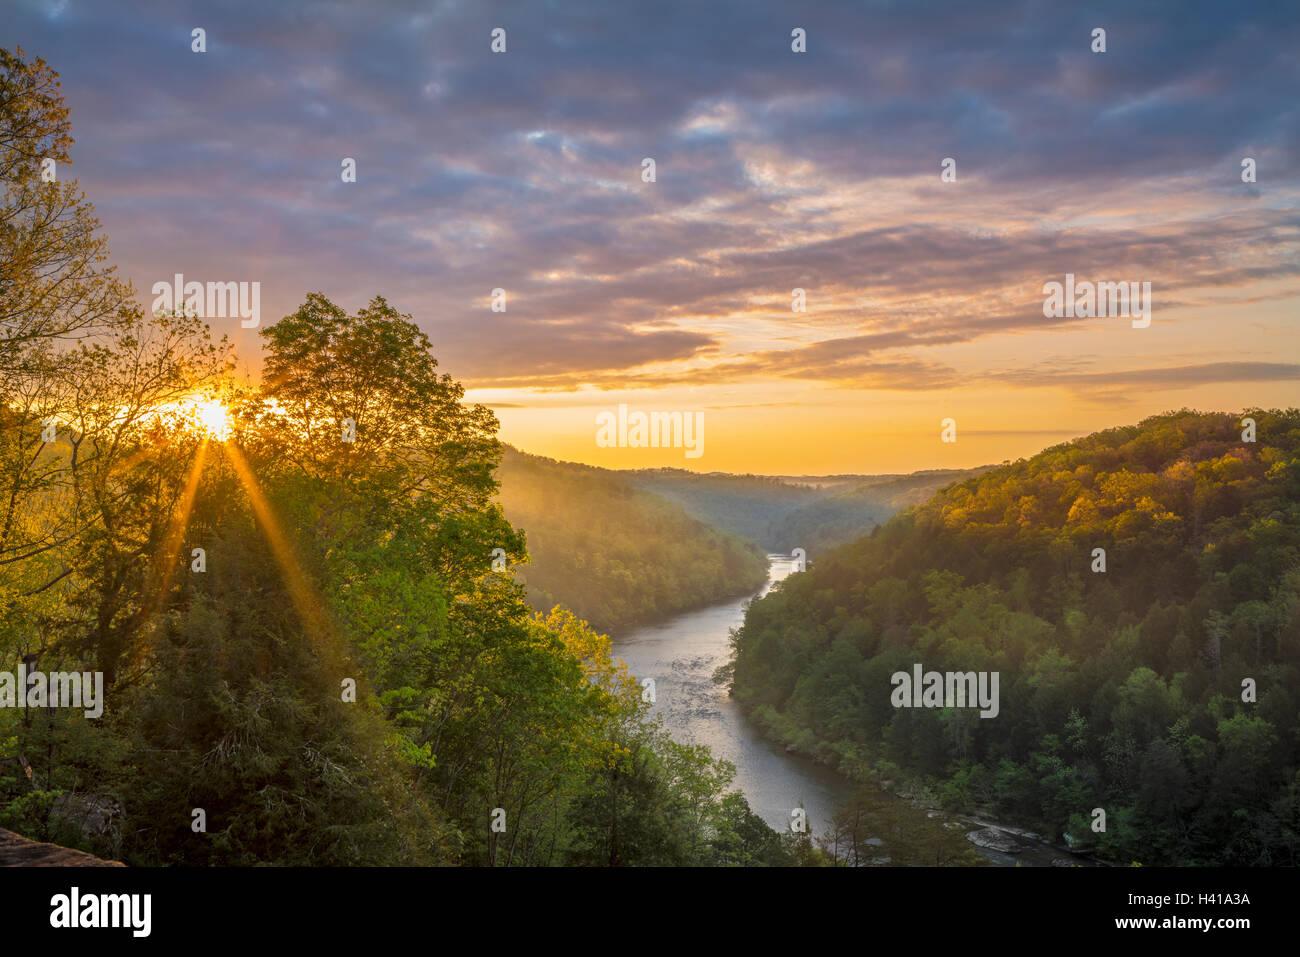 Cumberland Falls State Park, Kentucky: Sunrise over Cumberland river winding through Appalachian hills - Stock Image